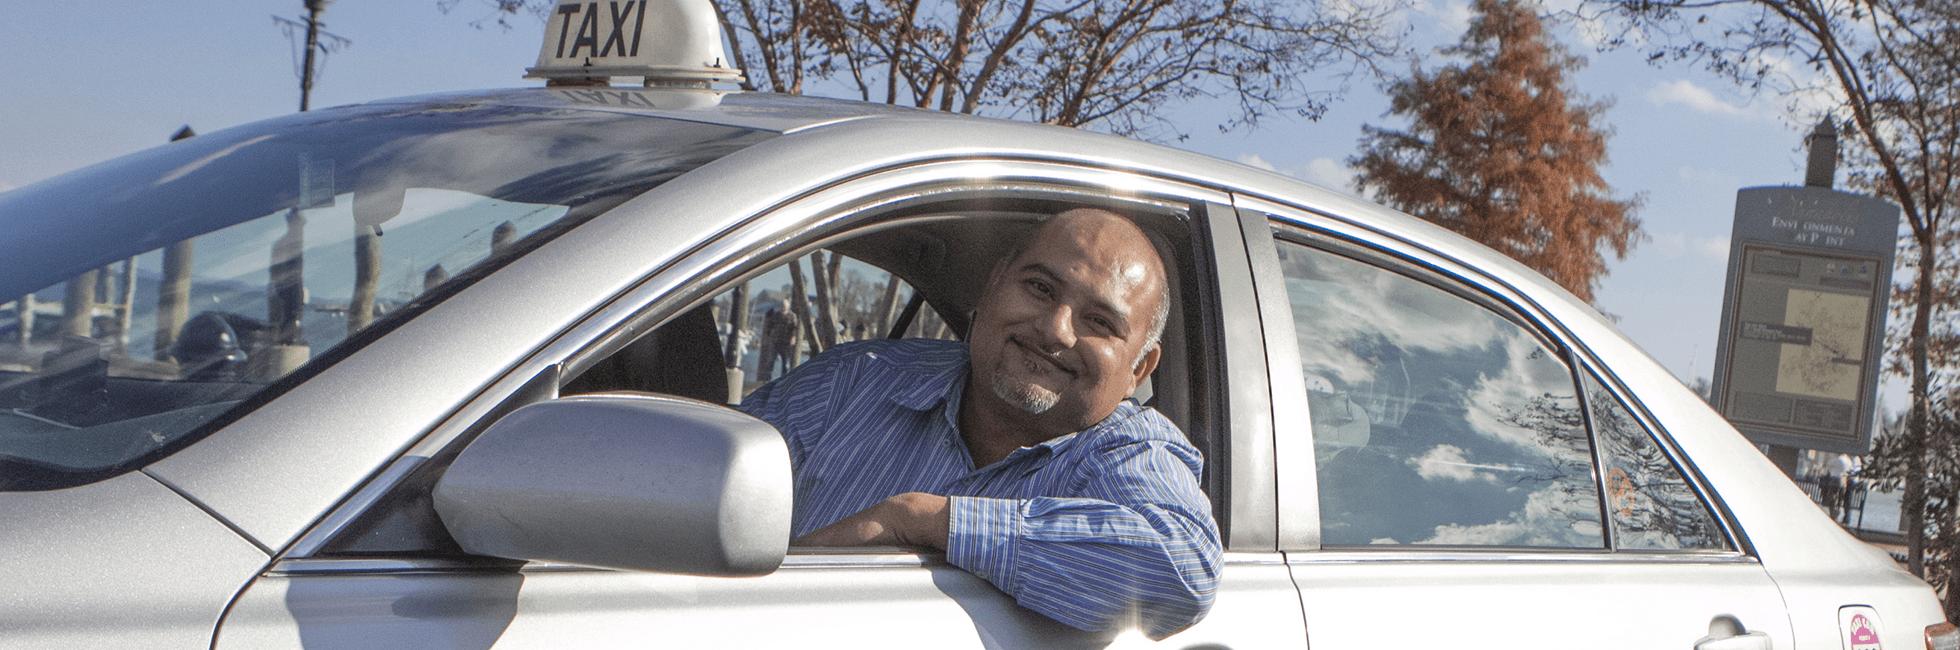 annapolis-taxi-cab